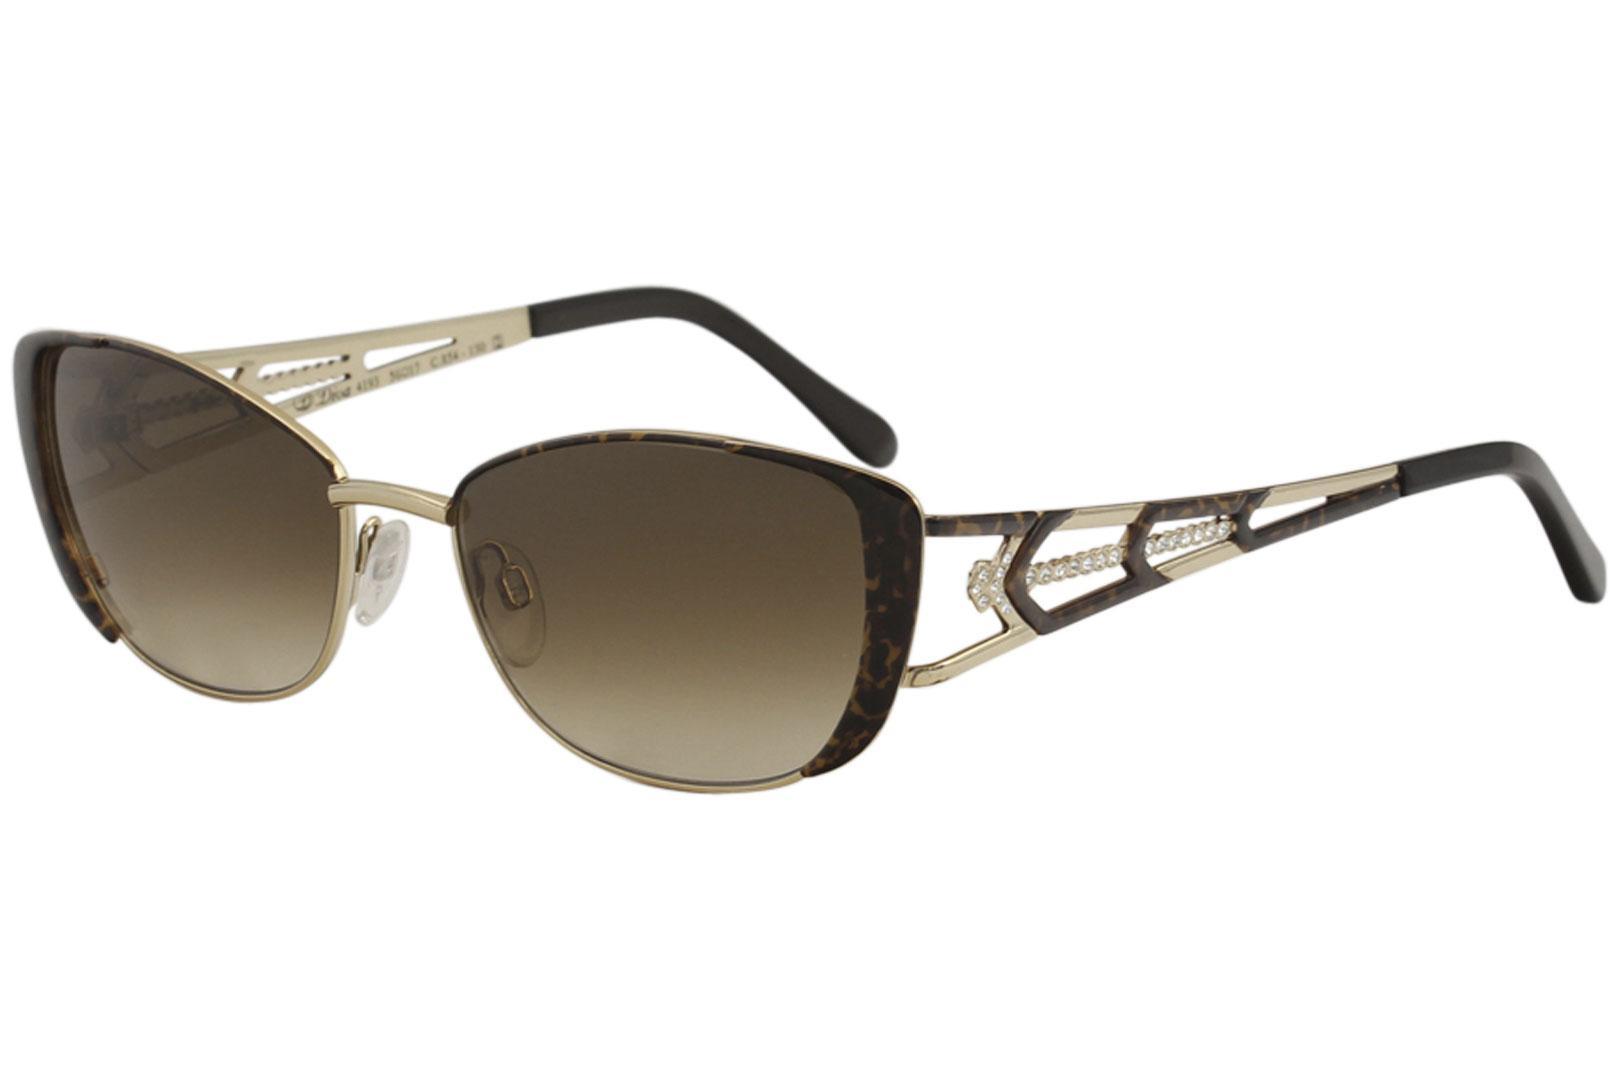 Image of Diva Women's 4193 Fashion Rectangle Sunglasses - Gold - Lens 56 Bridge 17 Temple 130mm